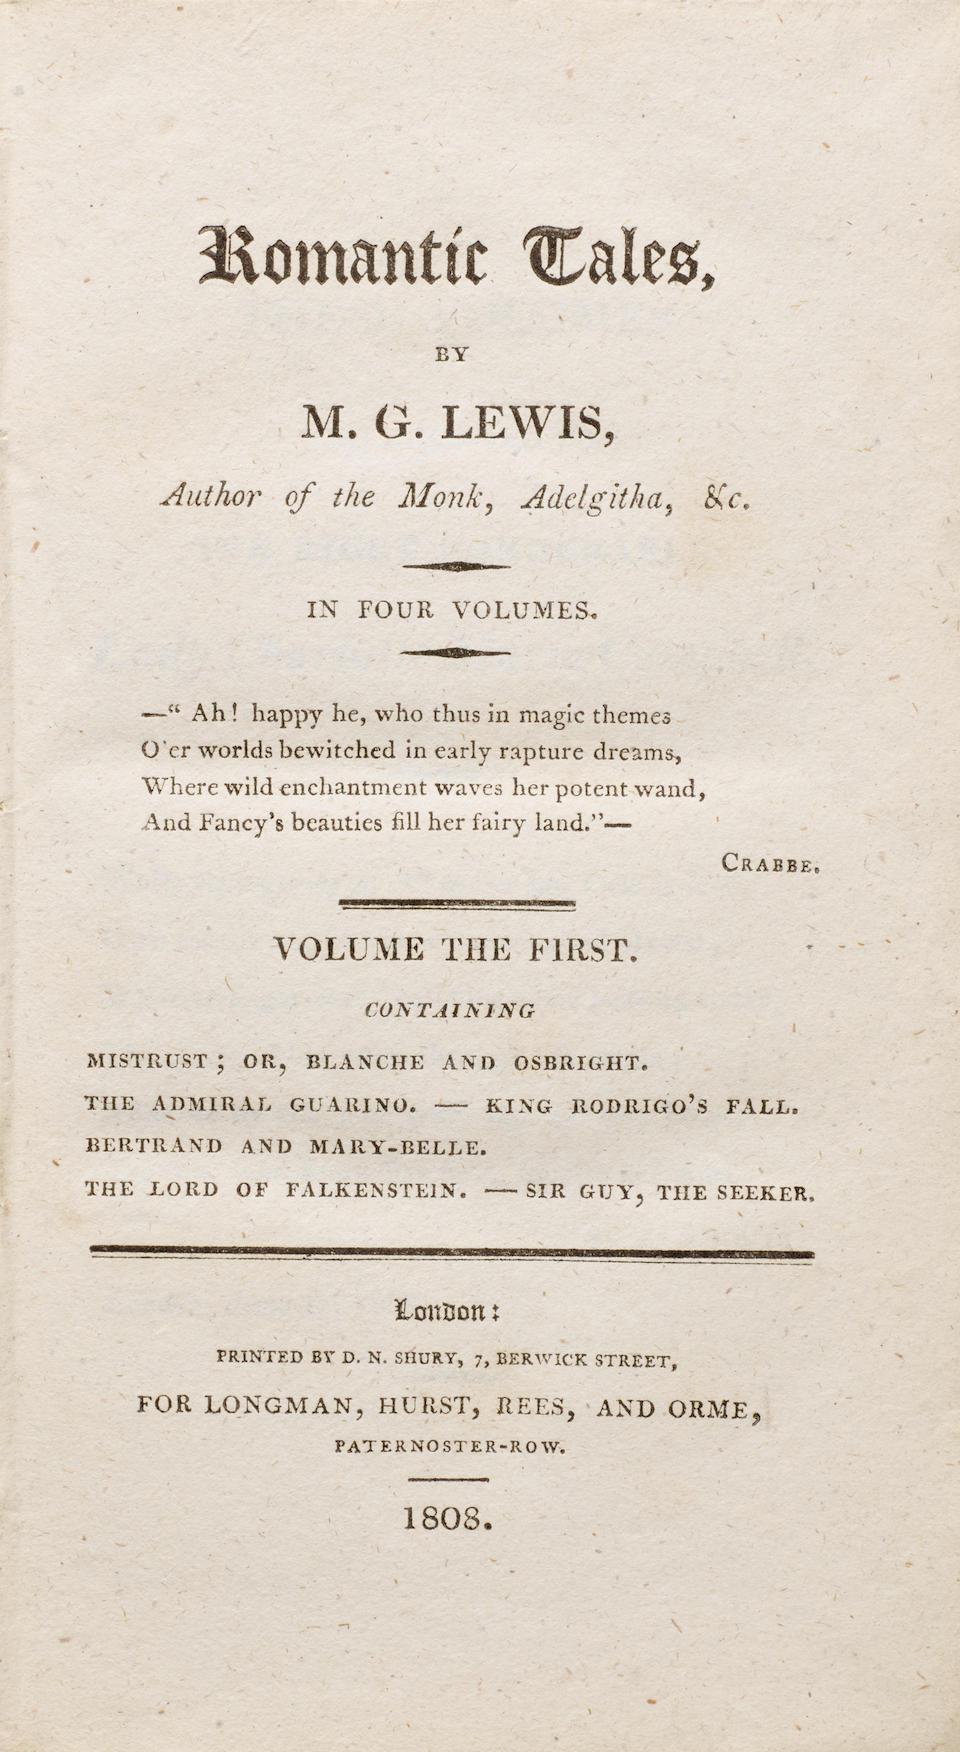 LEWIS, MATTHEW GREGORY. 1775-1818. Romantic Tales.  London: Longman, Hurst, Rees & Orme, 1808.